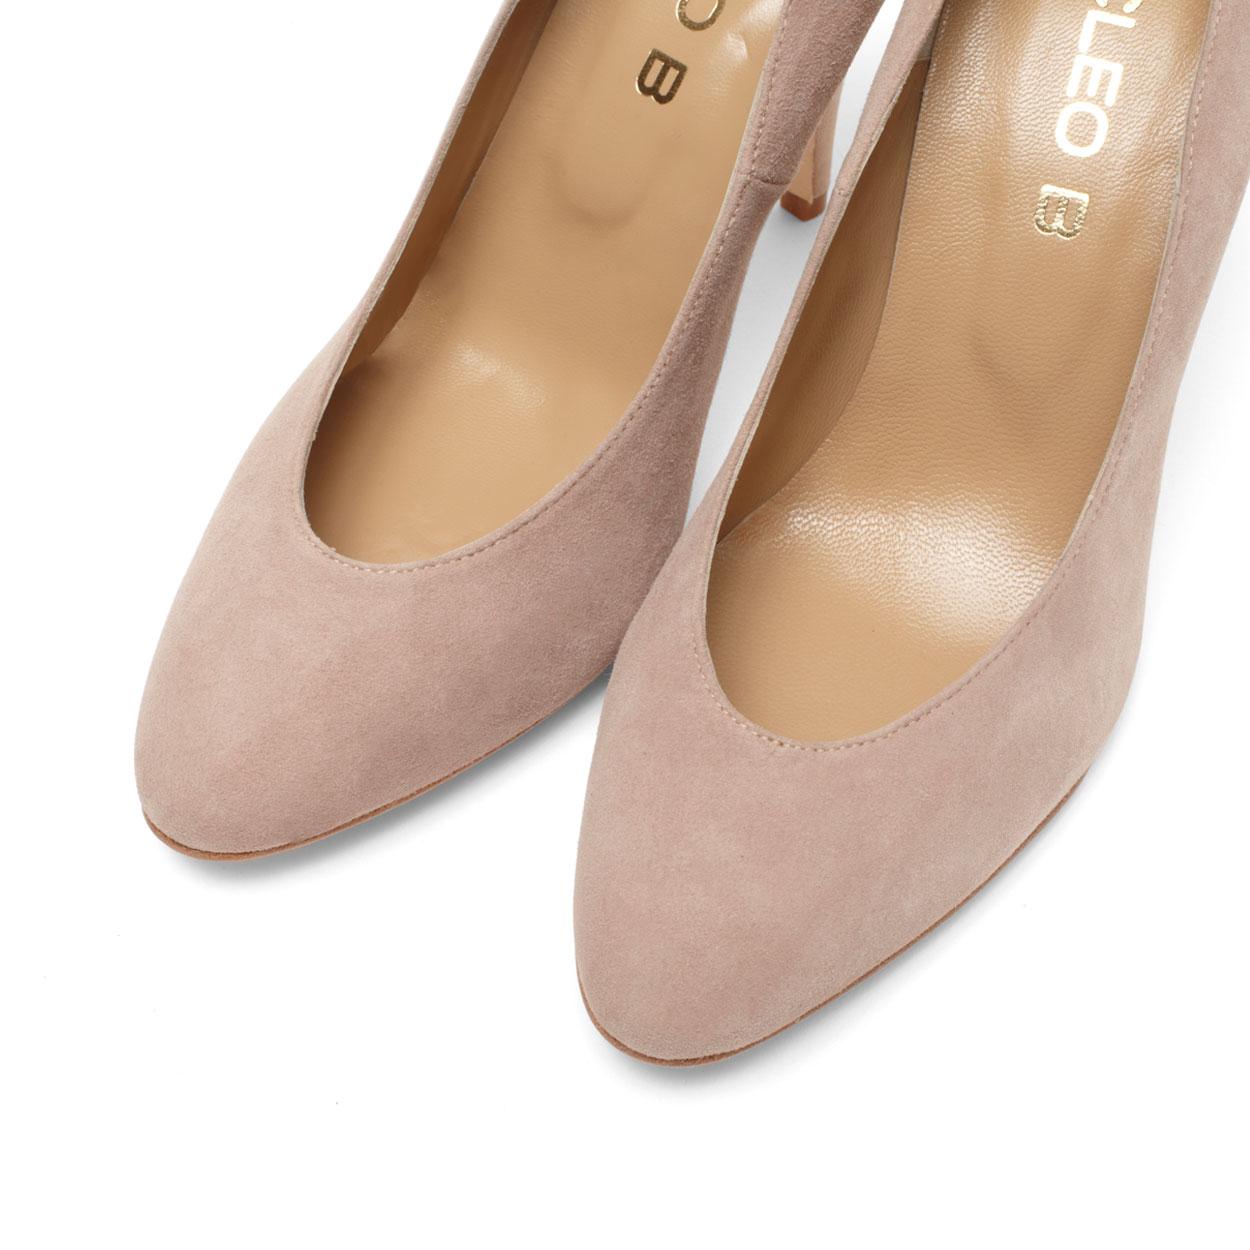 jazz-nude-toe-suede-shoes-heels-luxury-design-designer-cleob-london.jpg